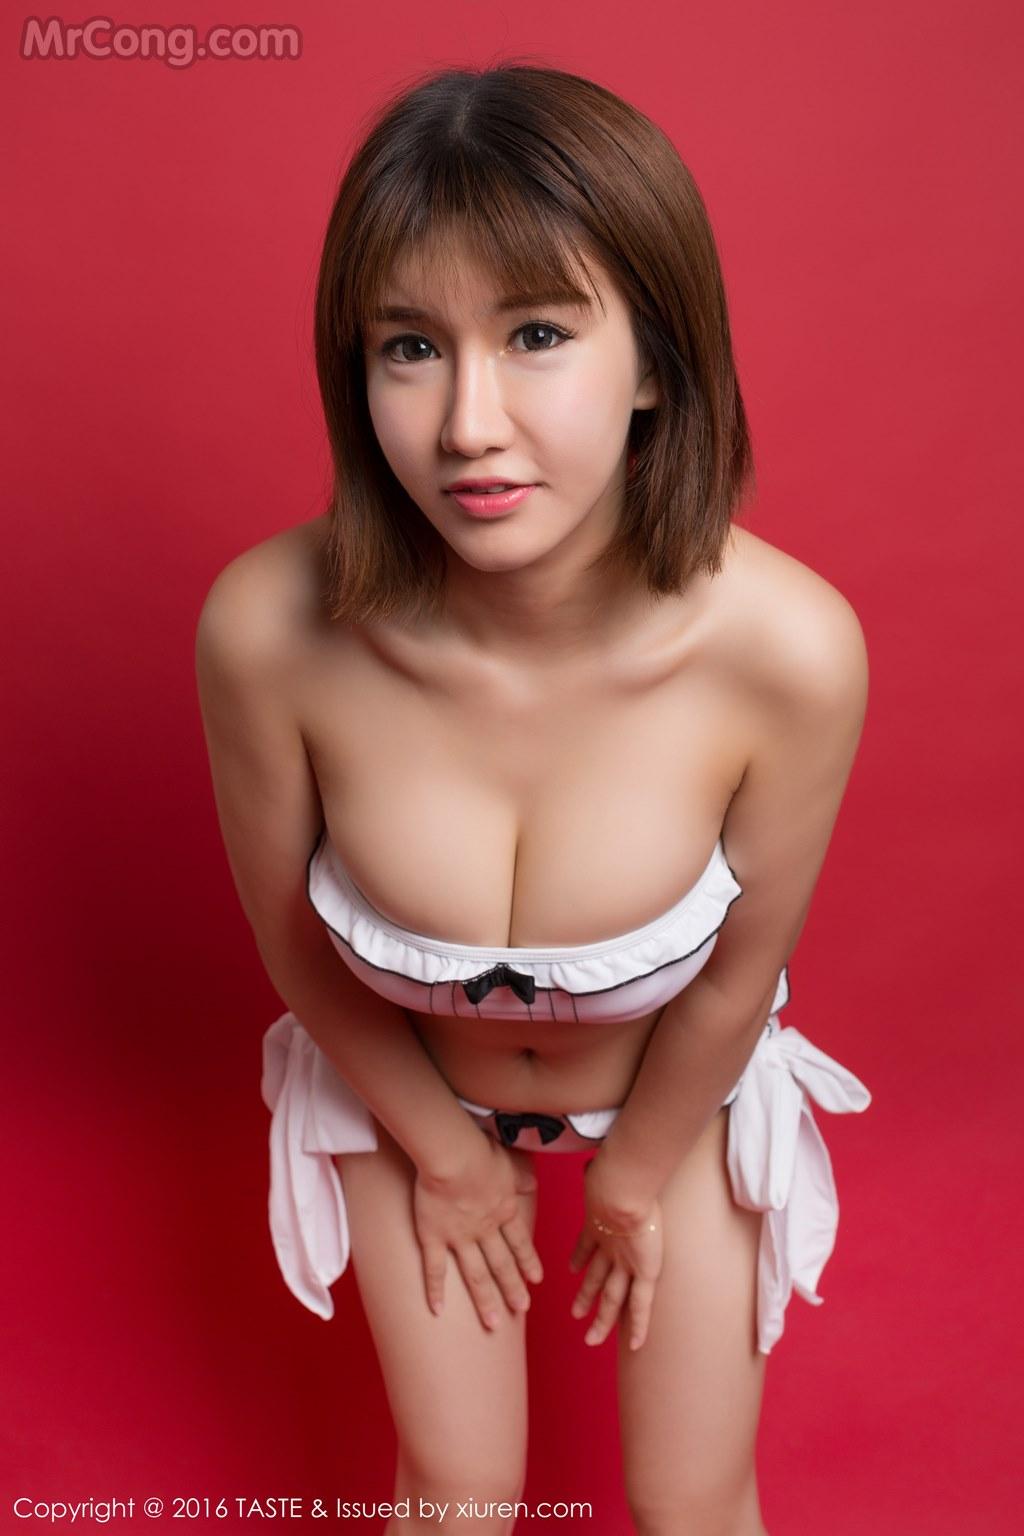 Image MrCong.com-TASTE-Vol.029-Aojiao-Meng-Meng-K8-017 in post TASTE Vol.029: Người mẫu Aojiao Meng Meng (K8傲娇萌萌Vivian) (40 ảnh)